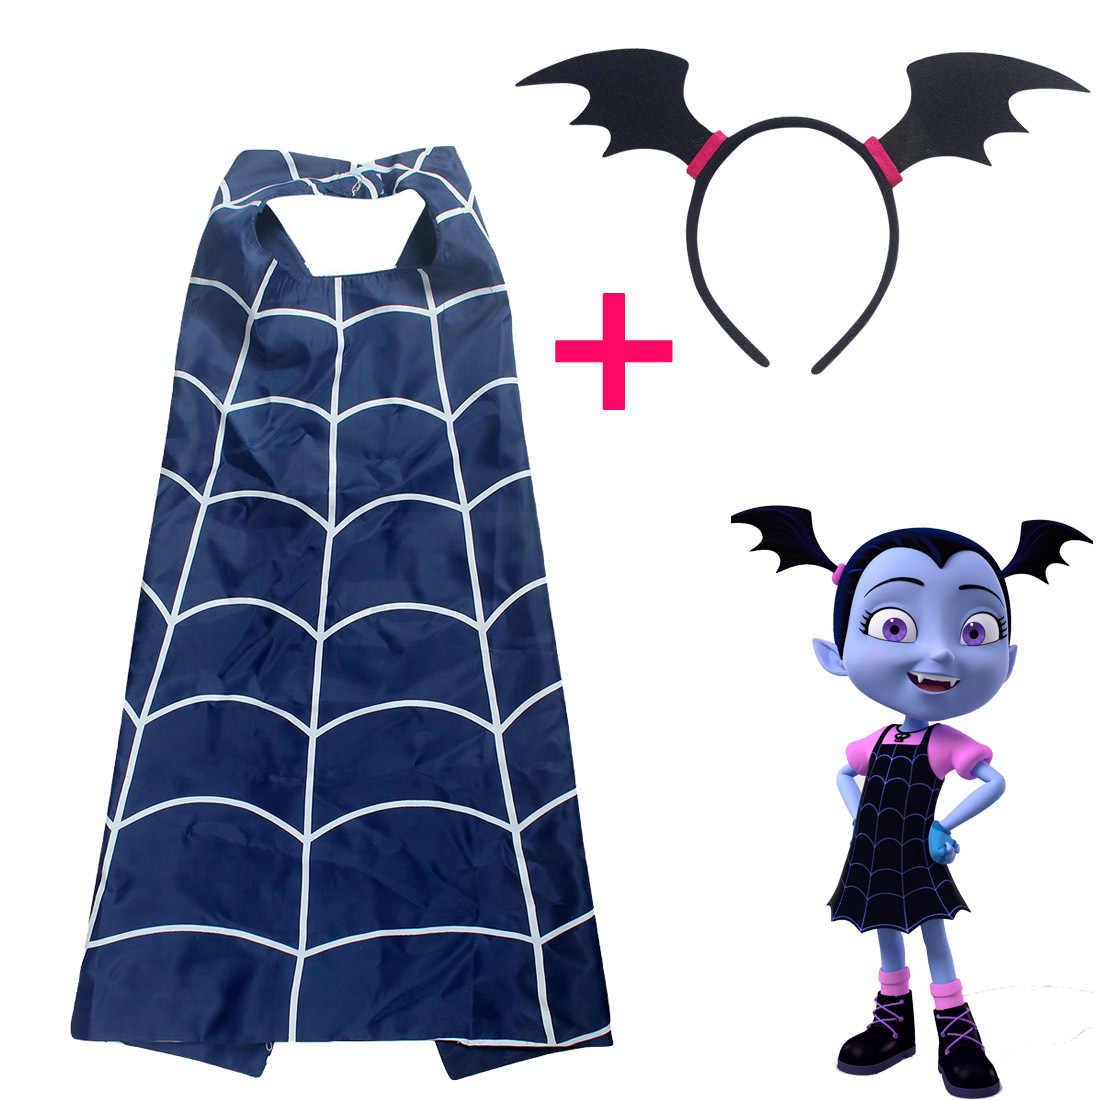 Vampirina Girls Cosplay Cartoon Cloak Cape Vampire Girl's Mask Headband Kids Party Christmas Gift Costumes Action Figure Toys